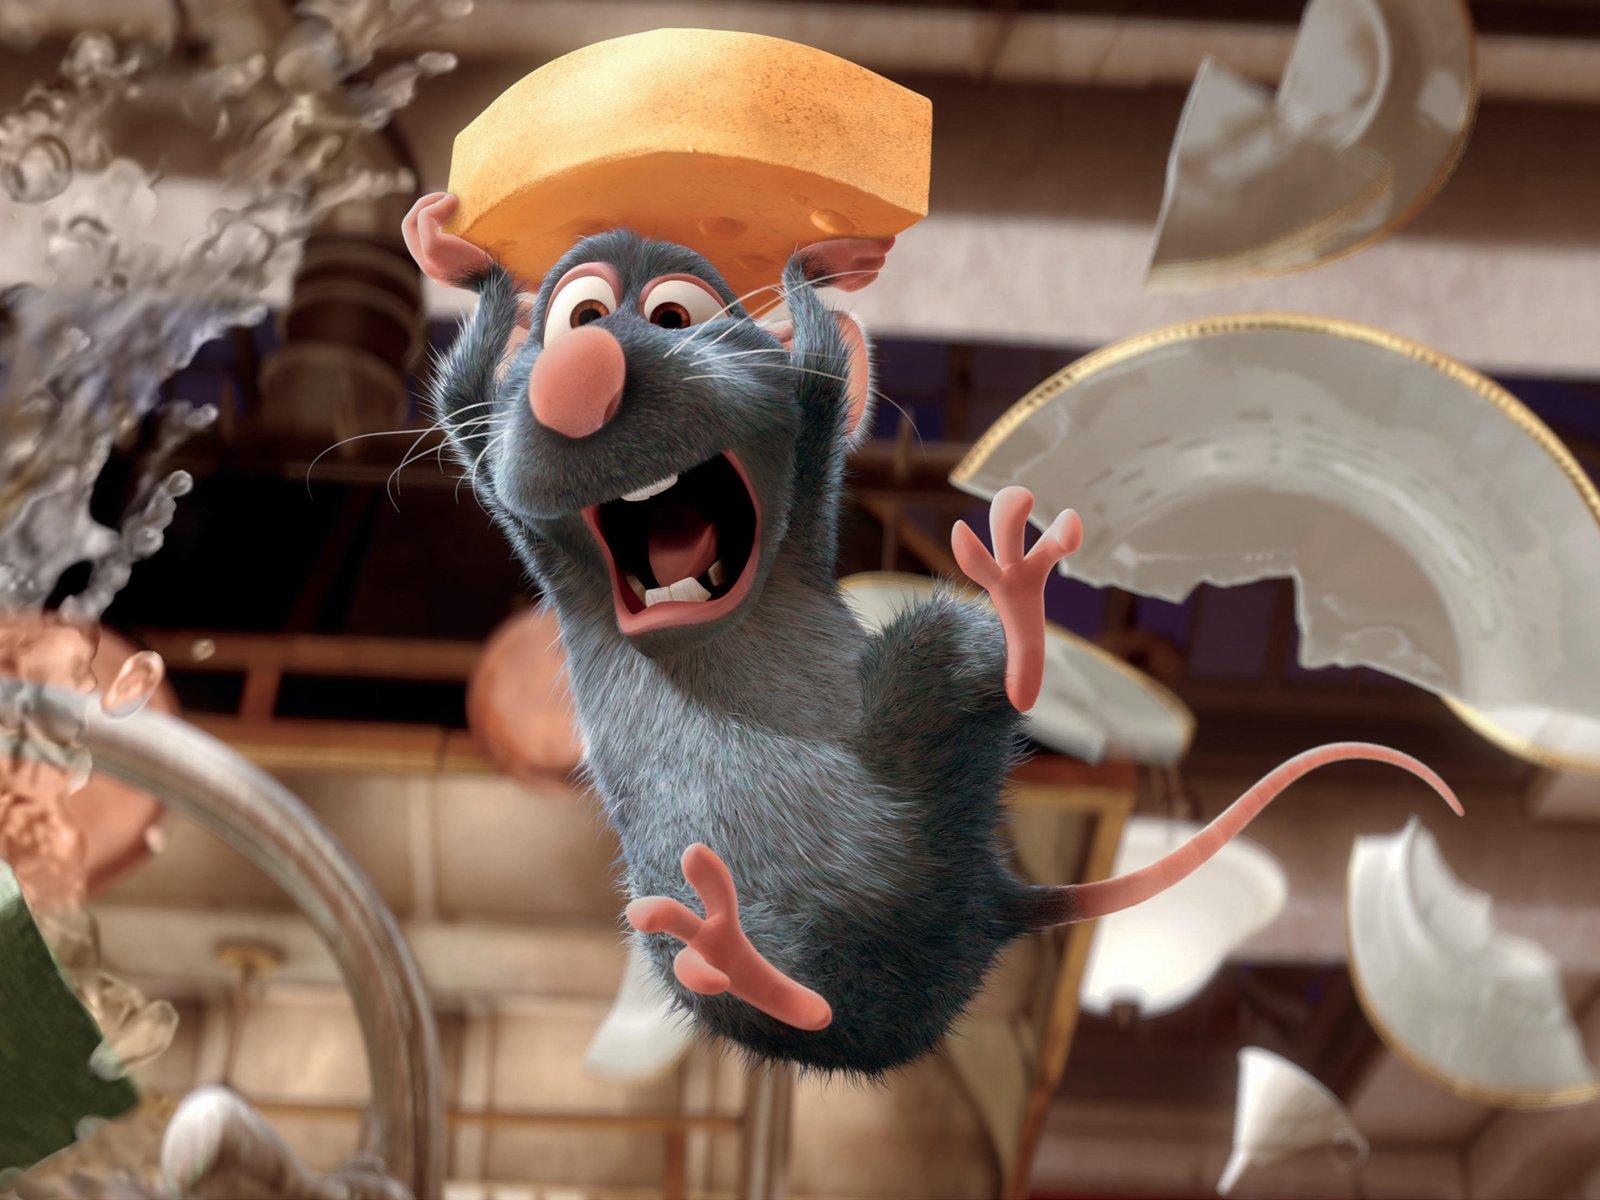 Недалеко от брянского ресторана сняли на видео полчища крыс